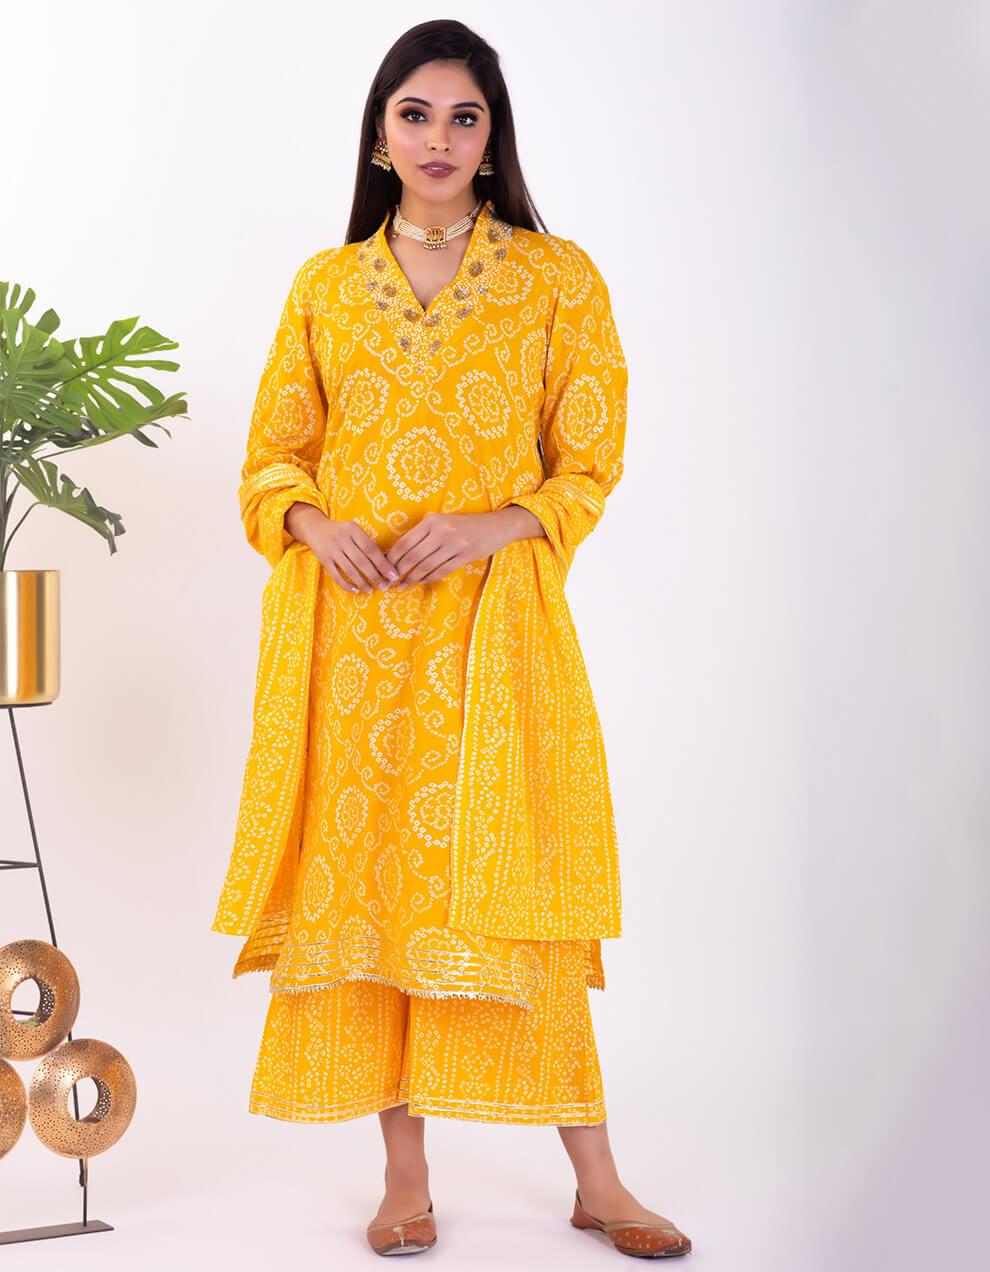 Yellow hand embroidered bandhani cotton kurta with palazzo and dupatta- Set of 3